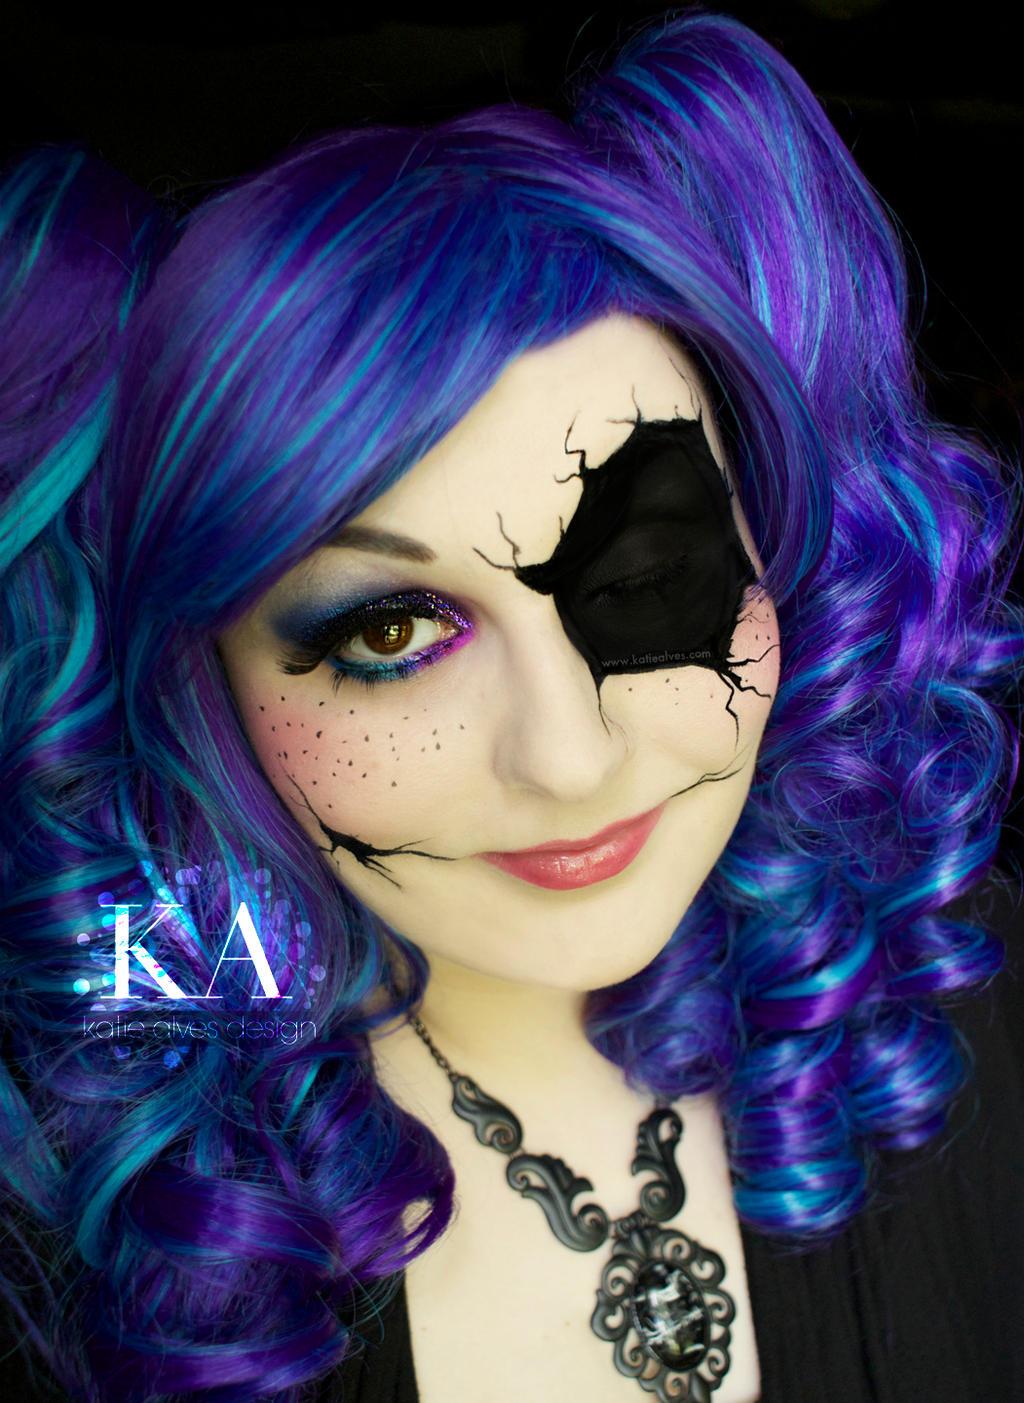 Broken Doll Halloween Makeup with Tutorial by KatieAlves - Pretty Halloween Makeup Tutorial